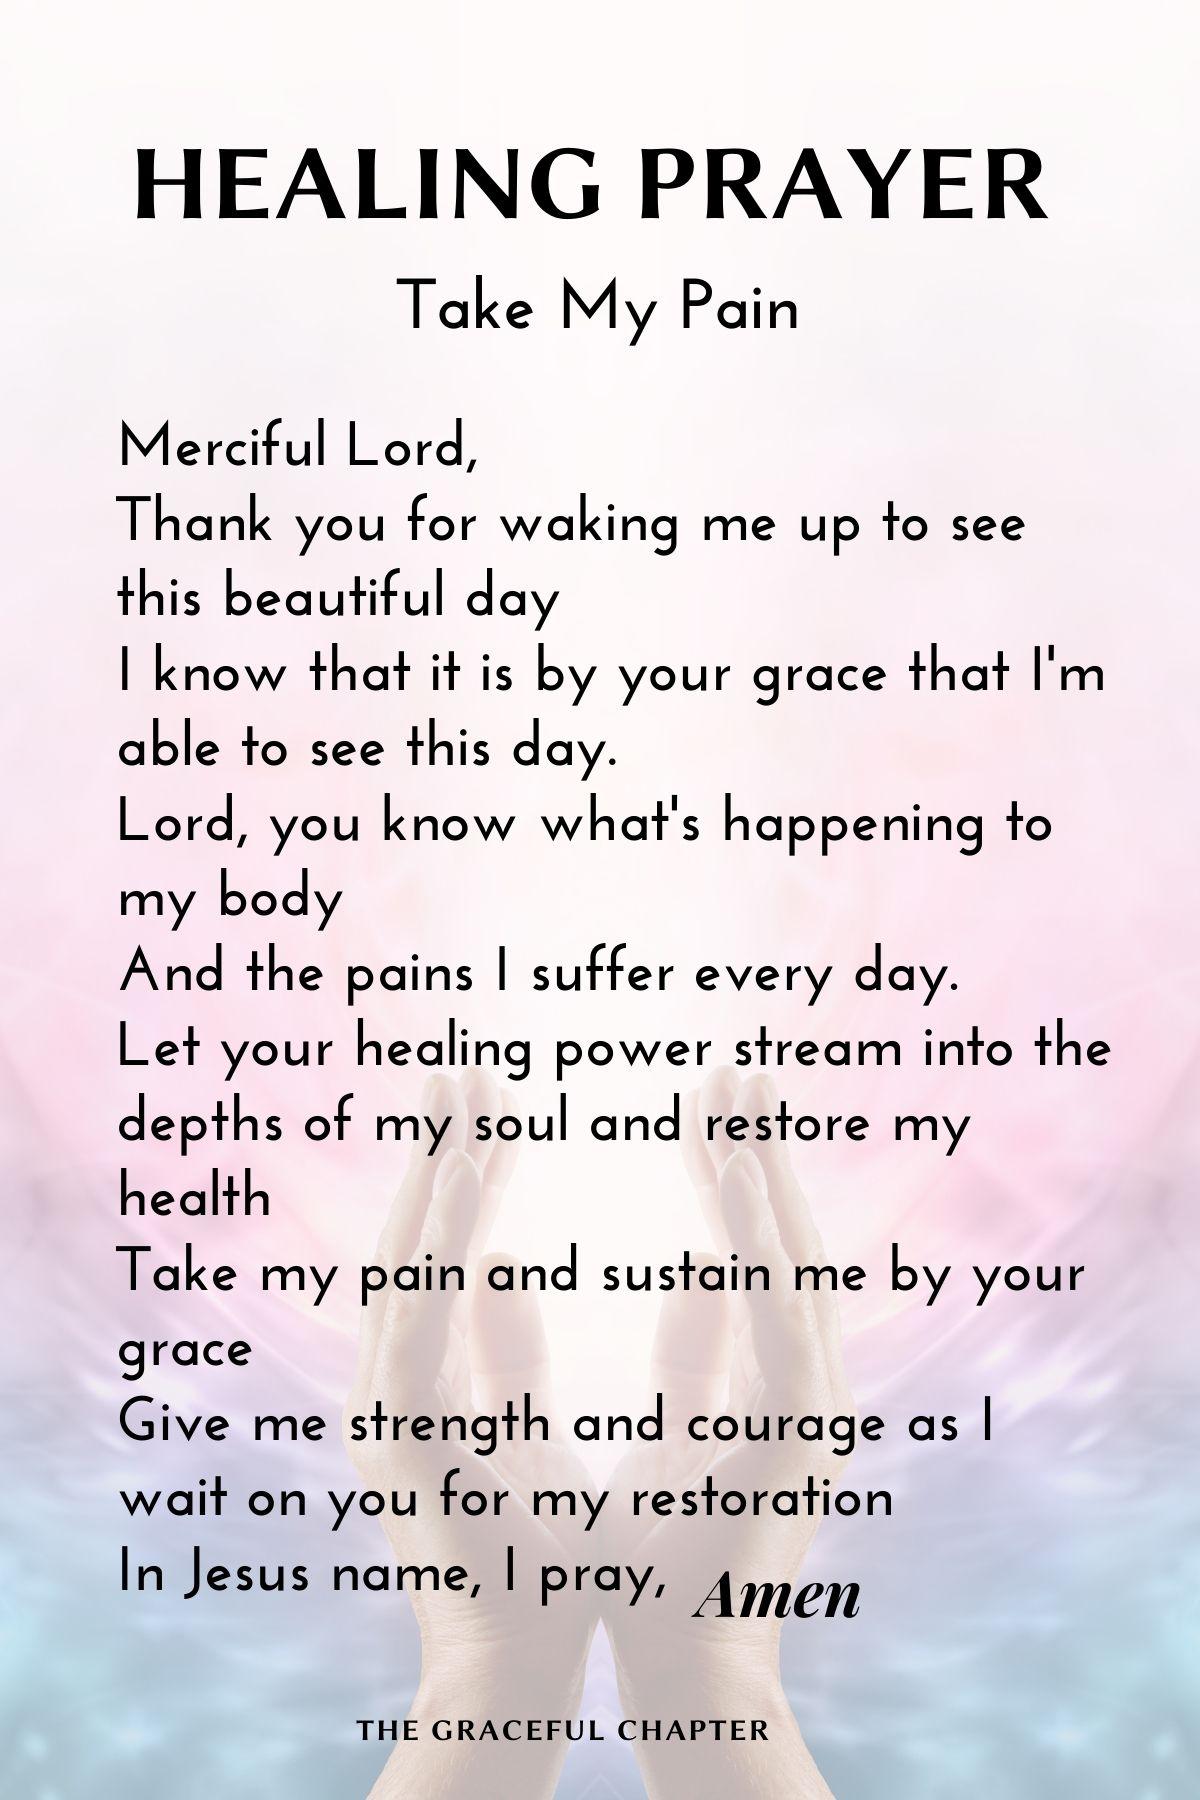 Healing prayer - Take my pain